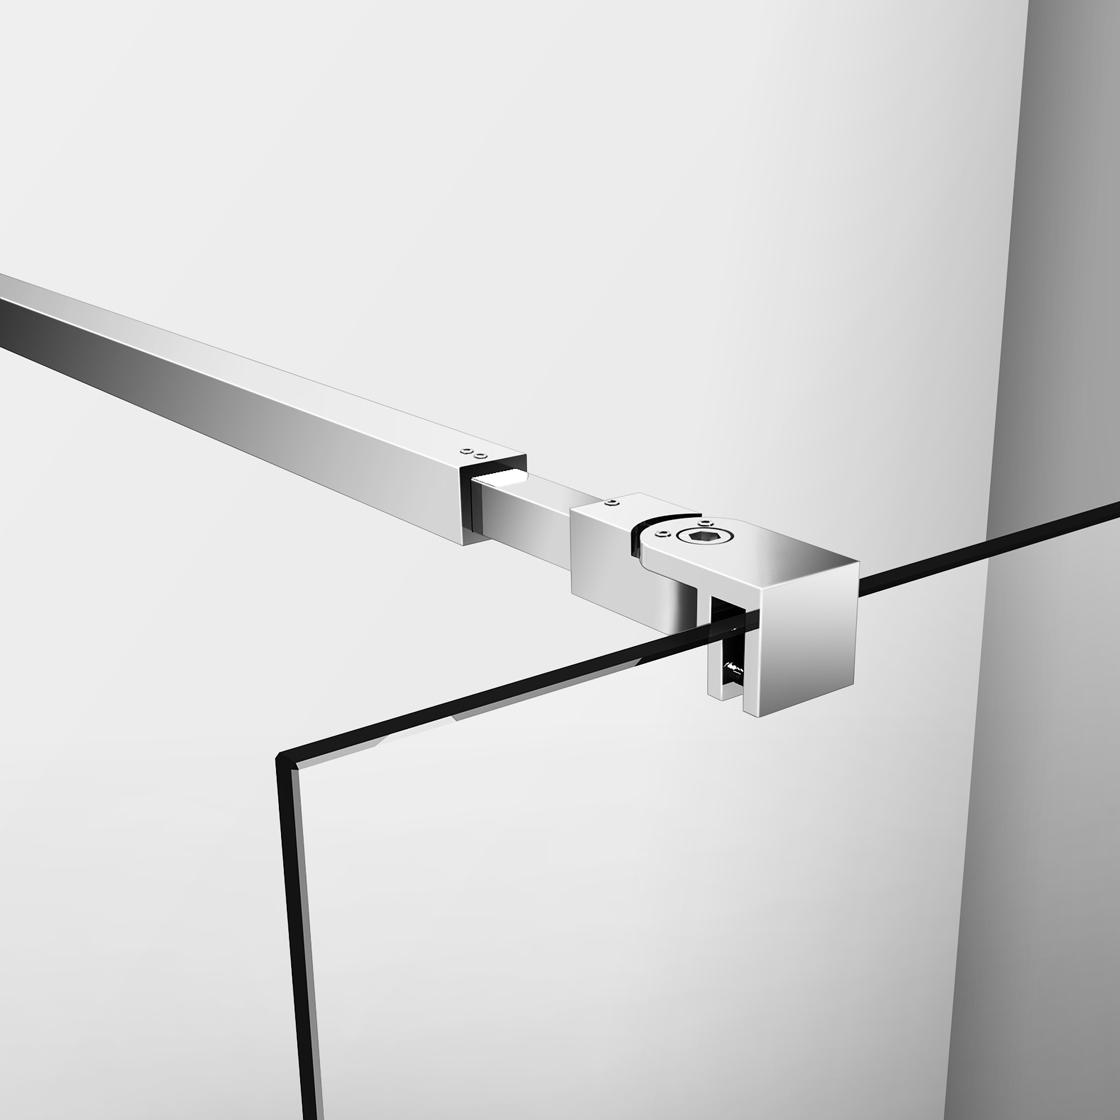 Flache Dusche Verstopft : Dusche Glaswand Nano : Walkin Dusche 60x200cm Duschabtrennung Nano